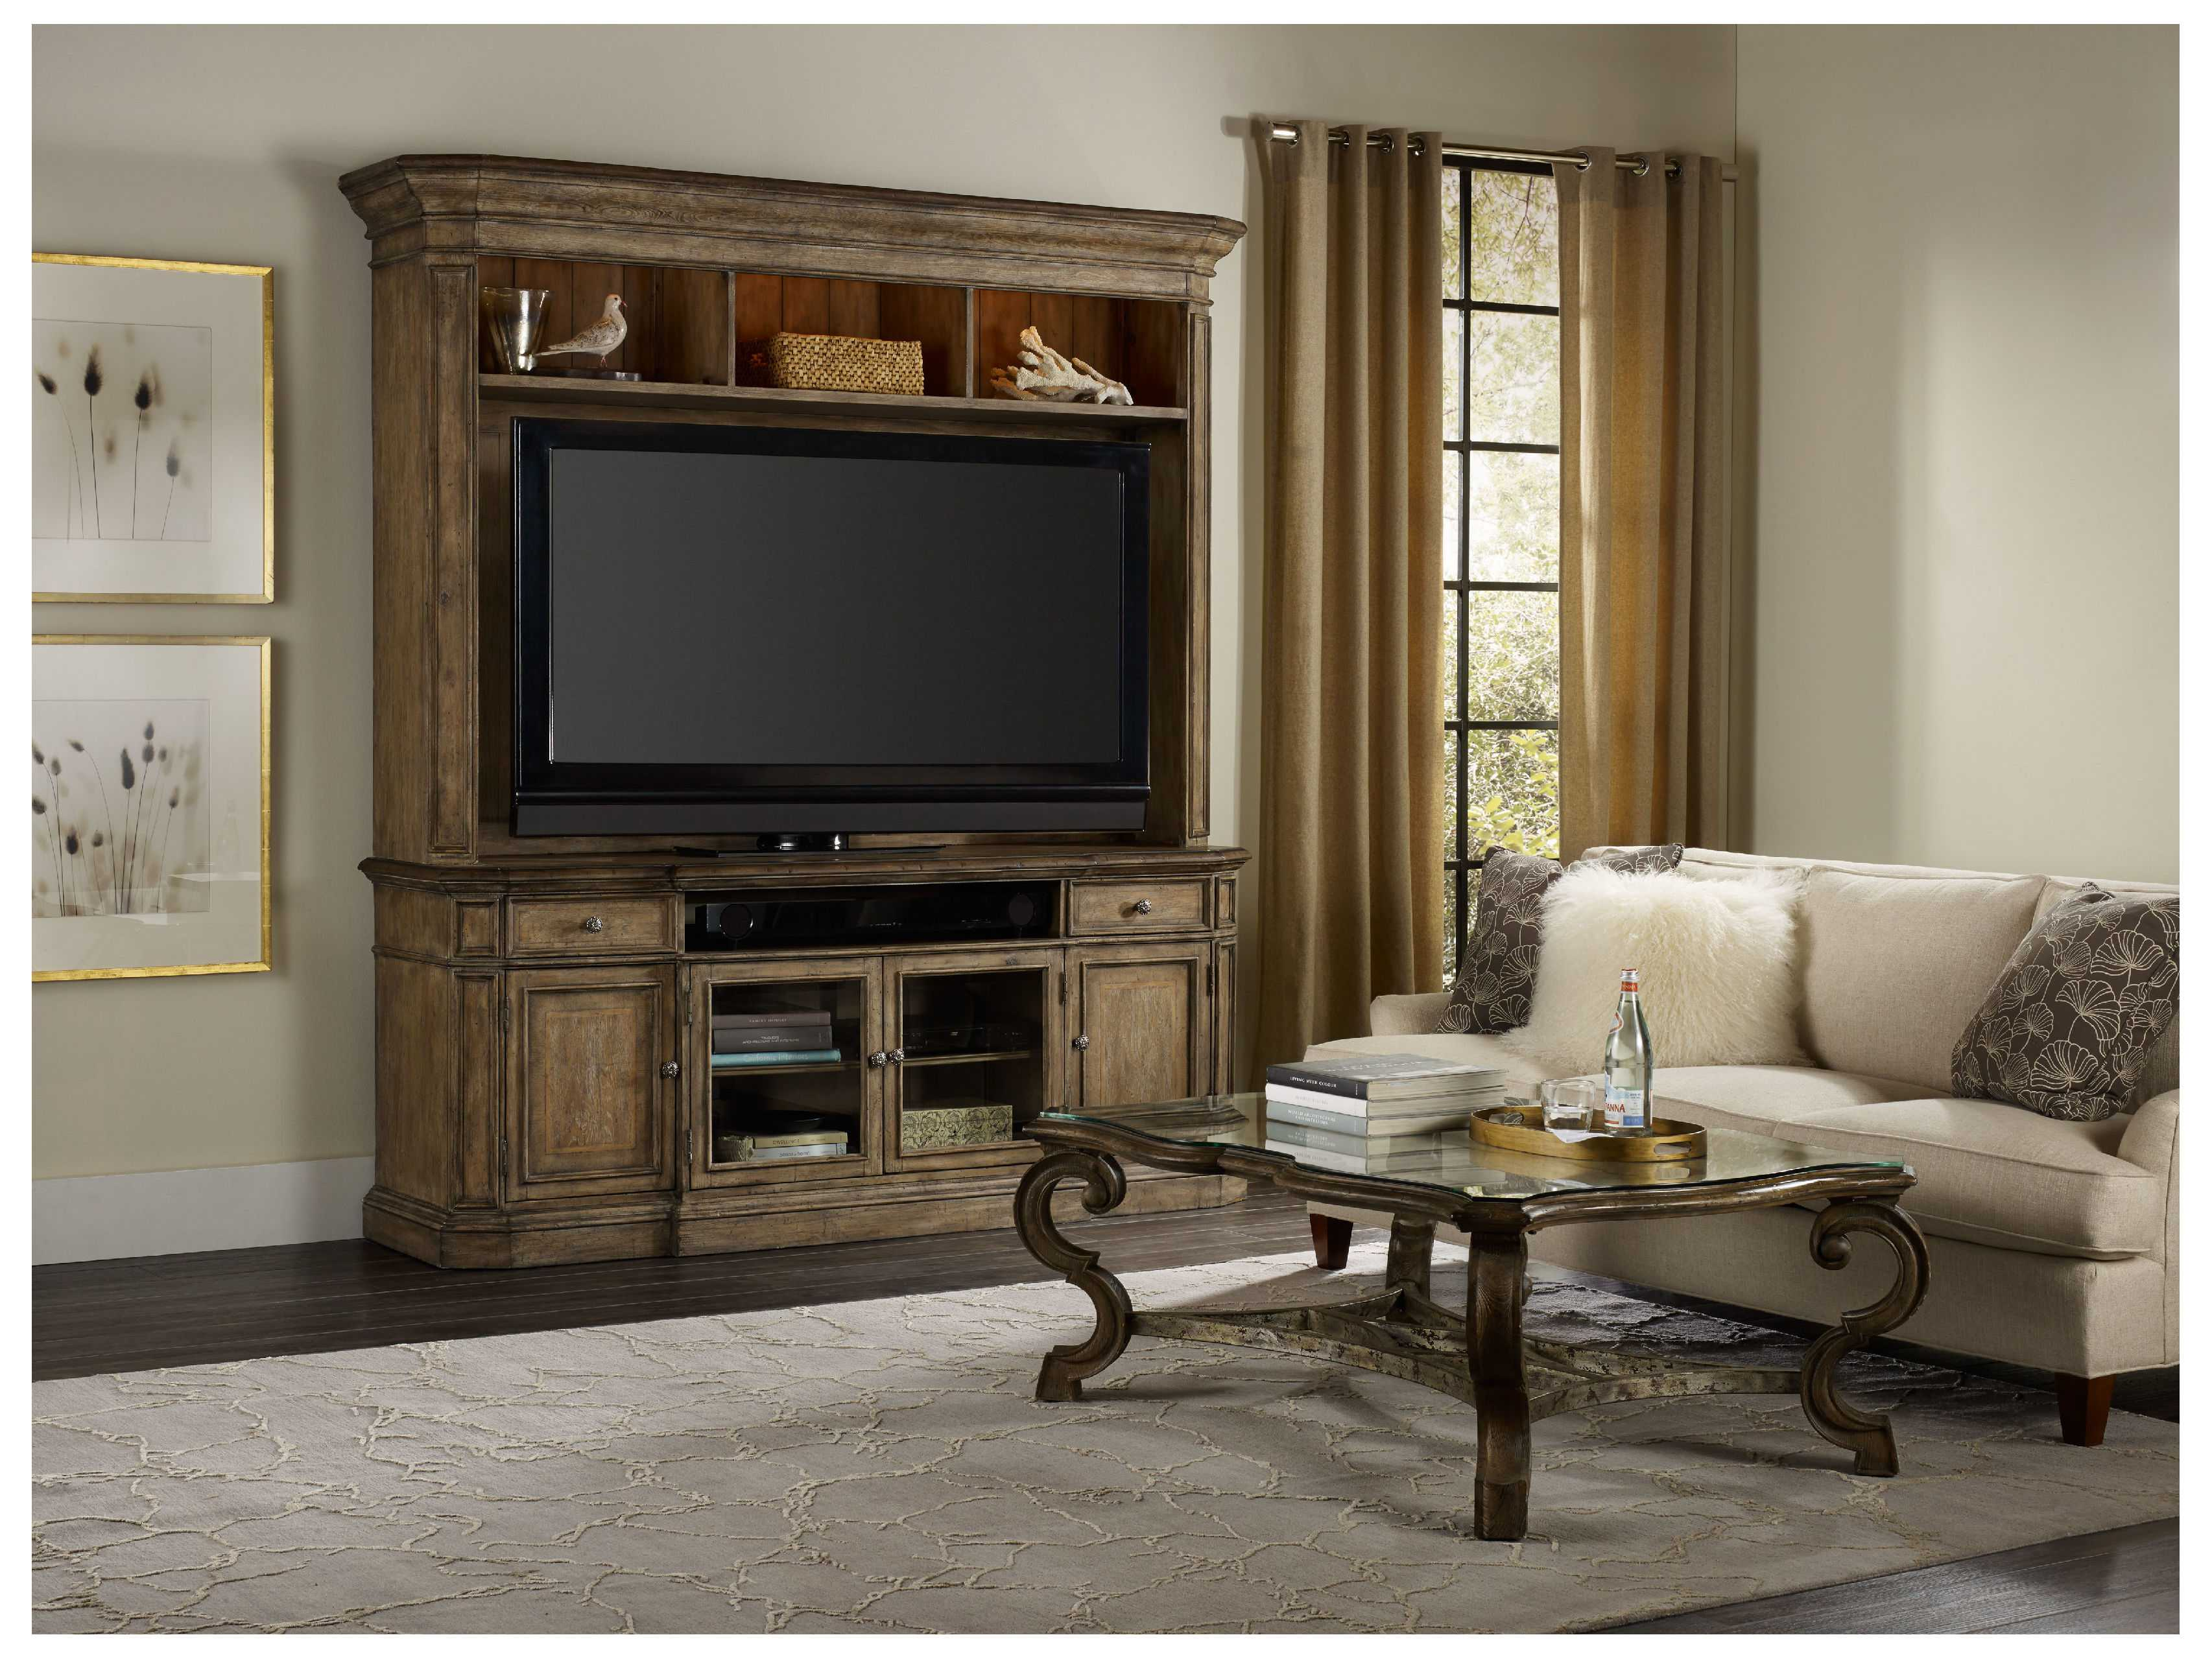 hooker furniture entertainment center. Hooker Furniture Solana Light Wood 86\u0027\u0027L X 23\u0027\u0027W Entertainment Center I